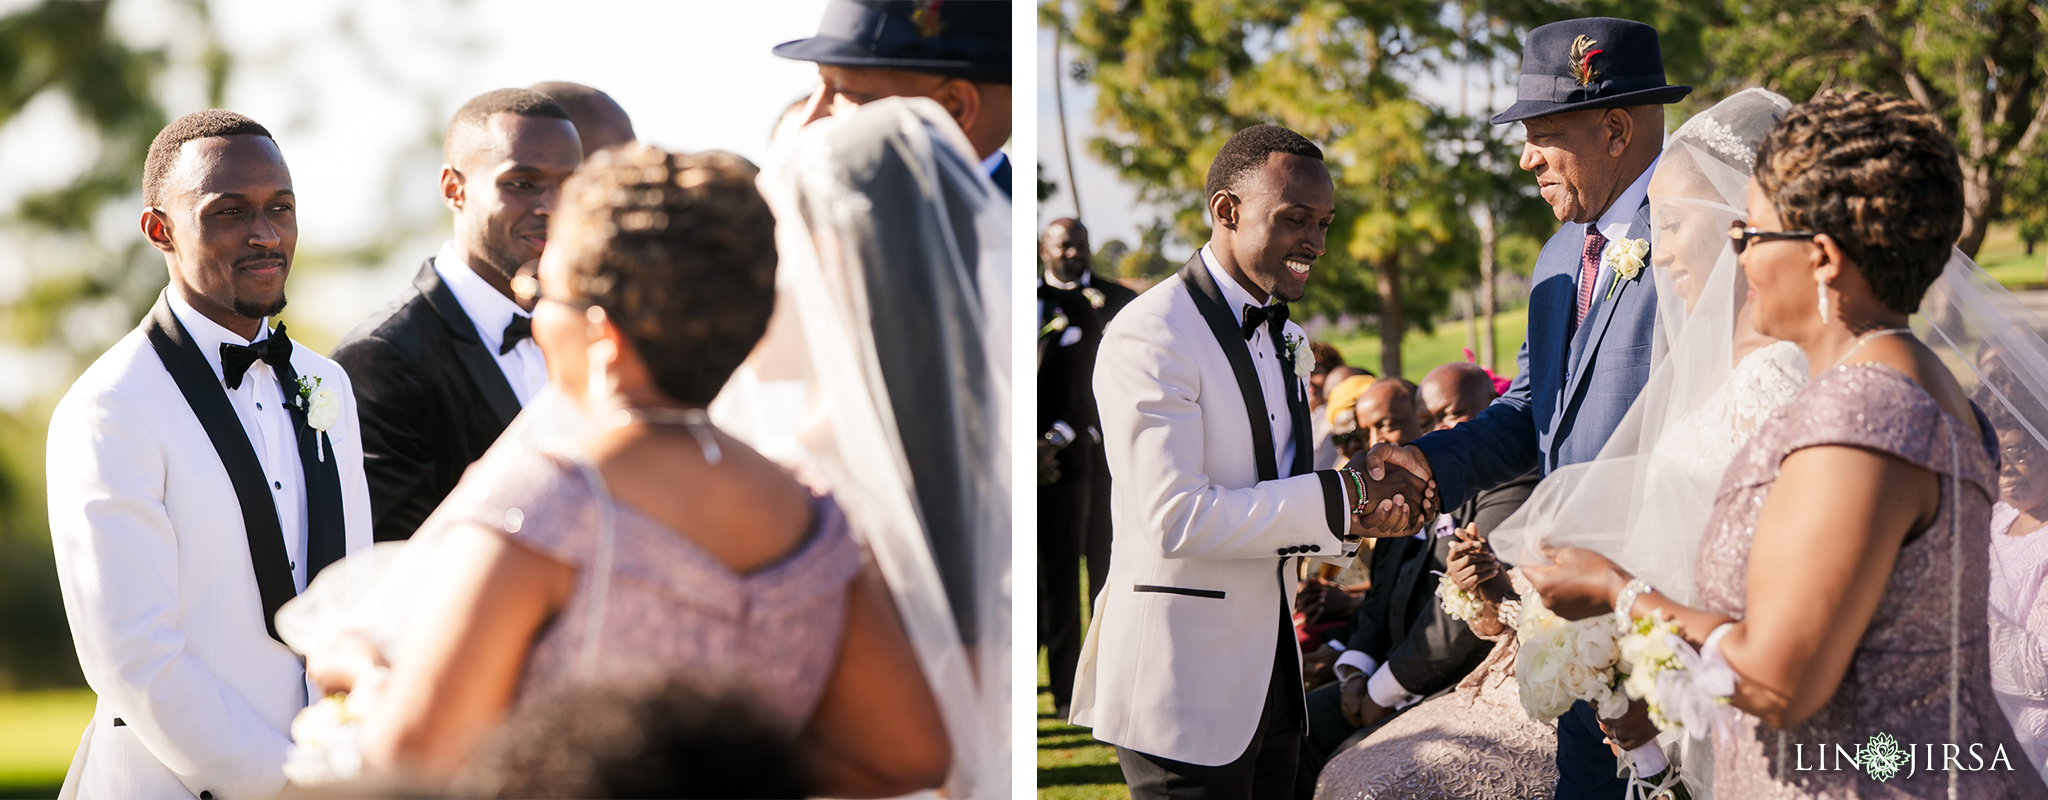 19 Los Verdes Golf Course Palos Verdes Kenyan Wedding Photography